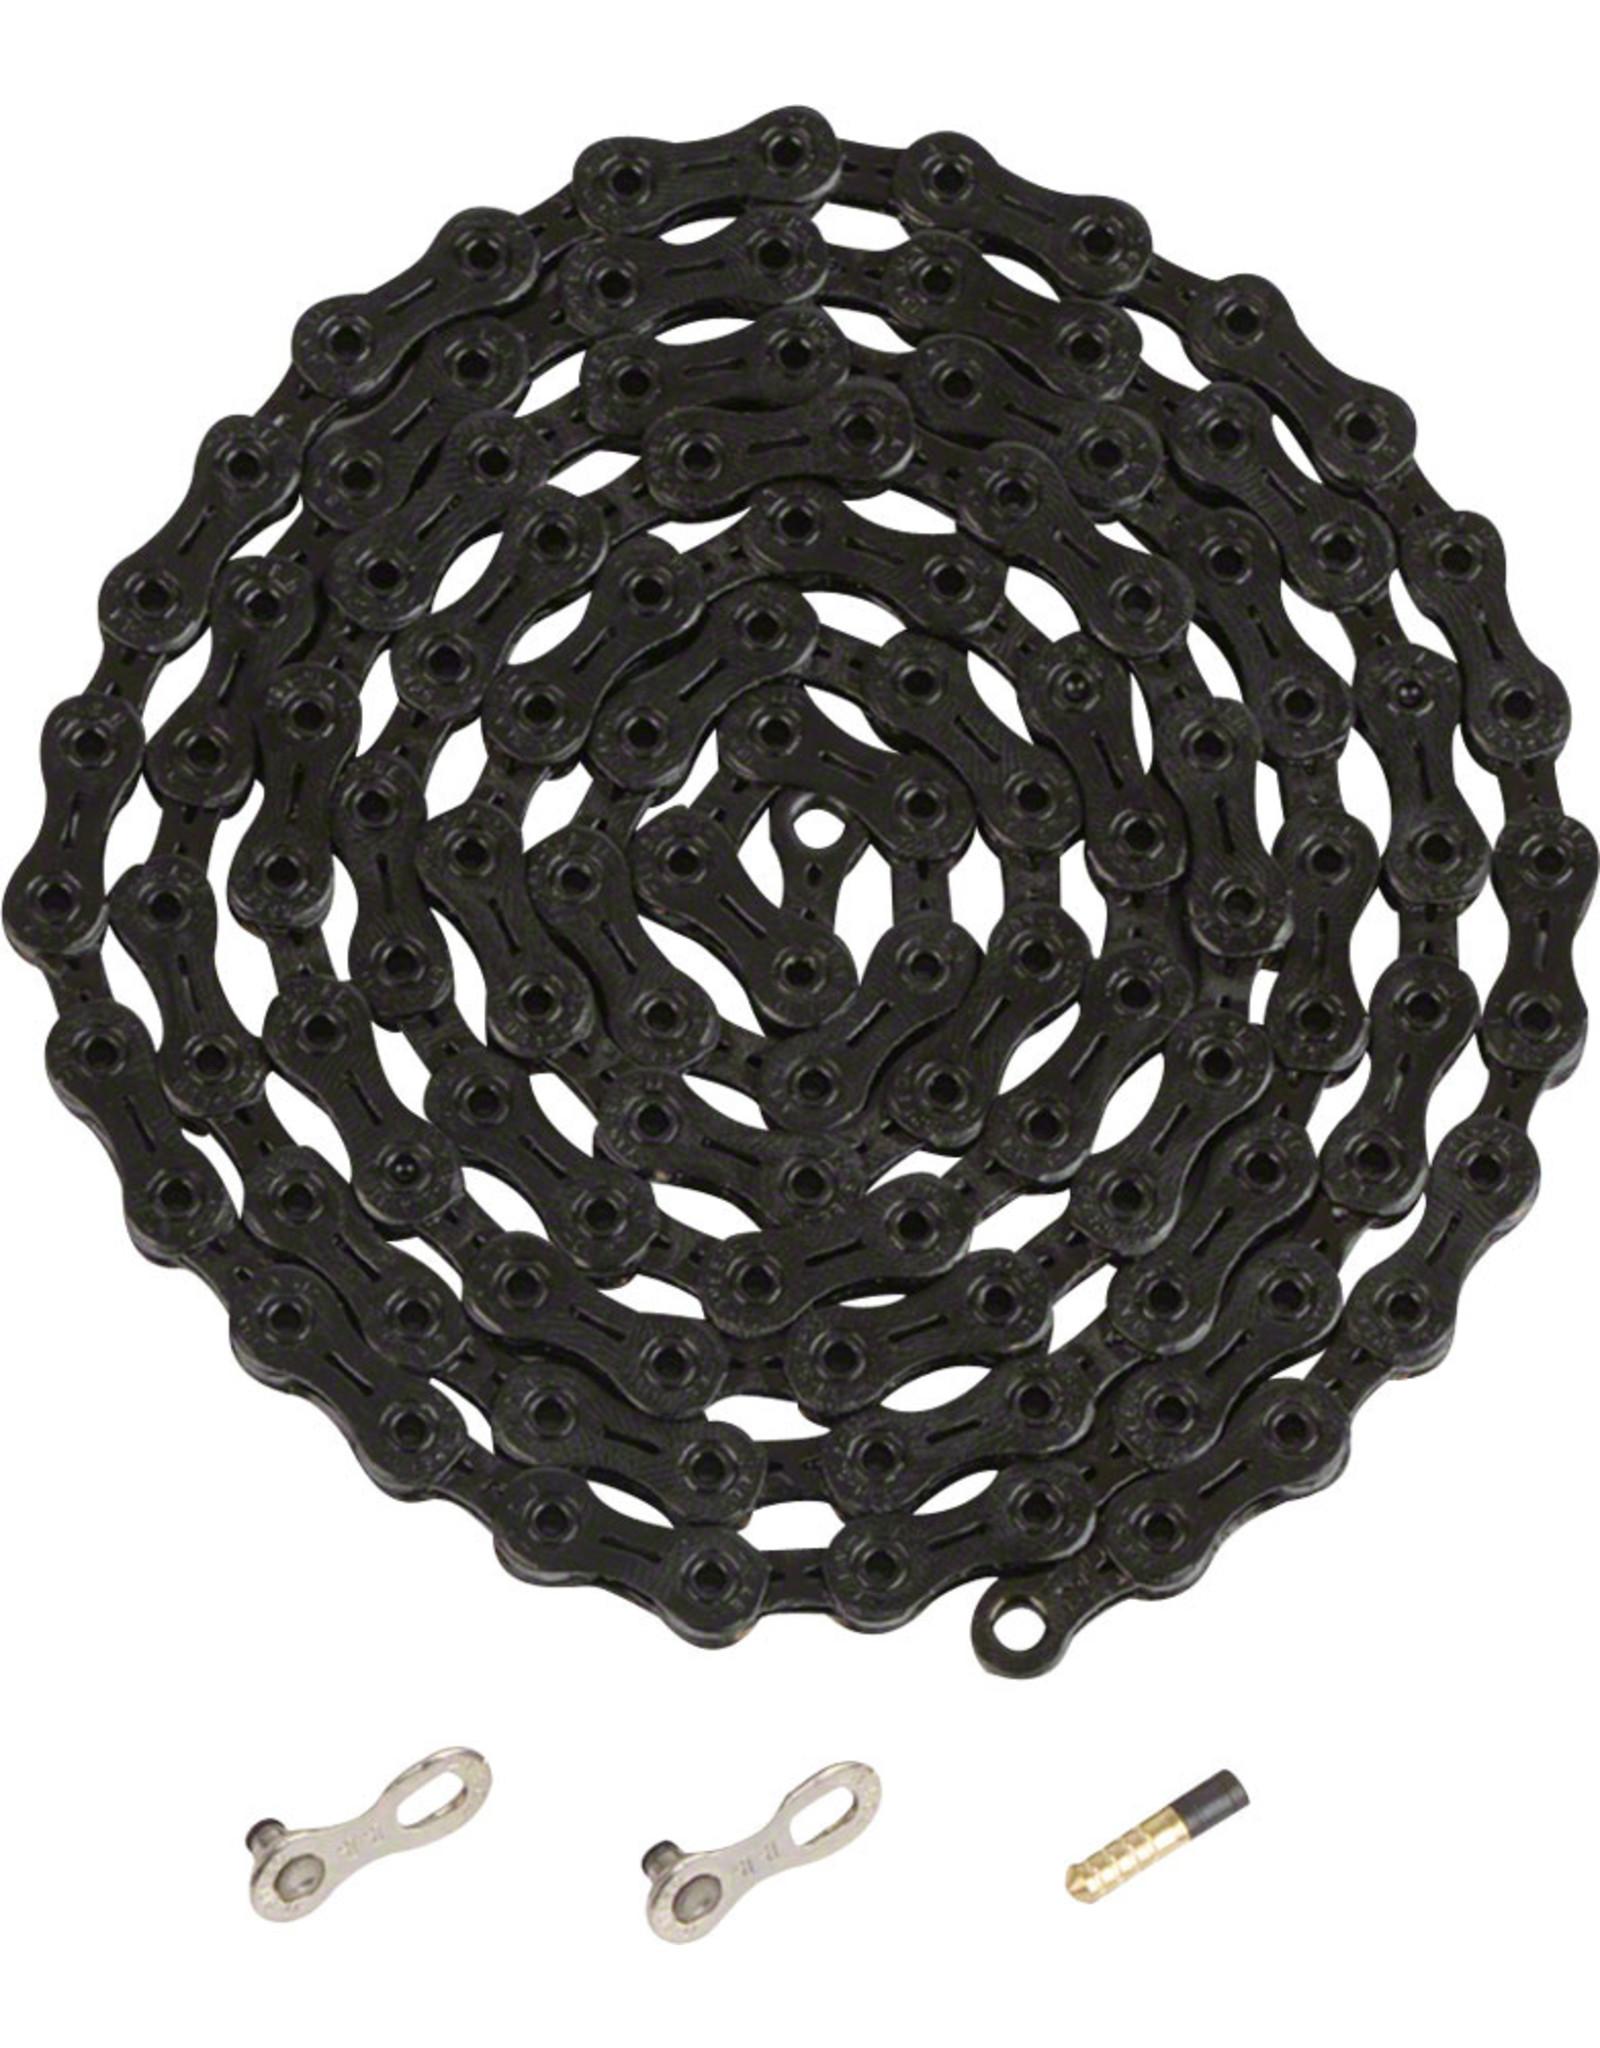 YBN YBN 11 Speed Ti-Nitride Chain Black - SLA110